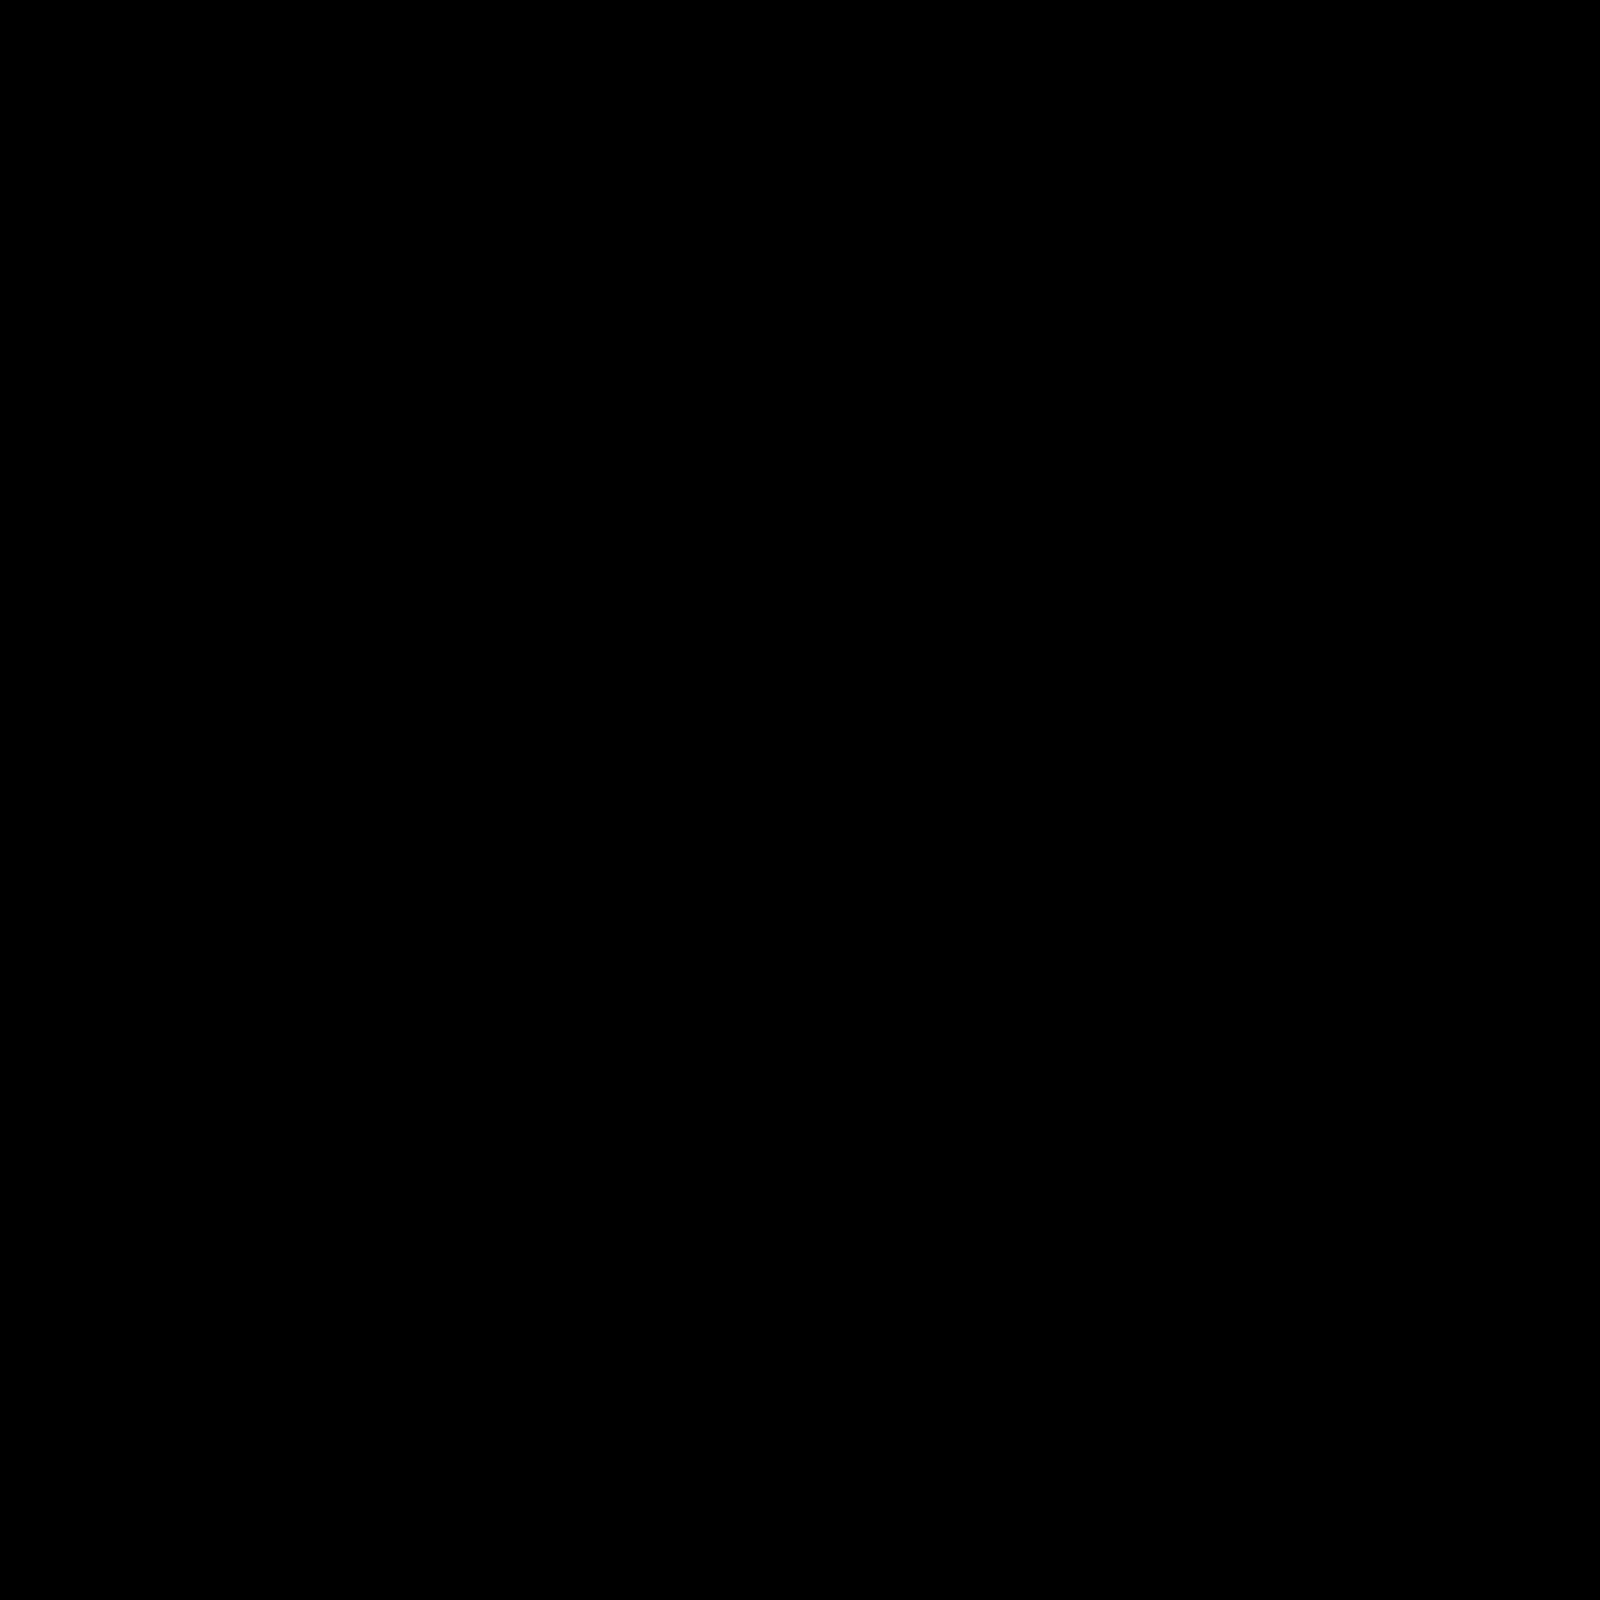 Import 'CSV icon